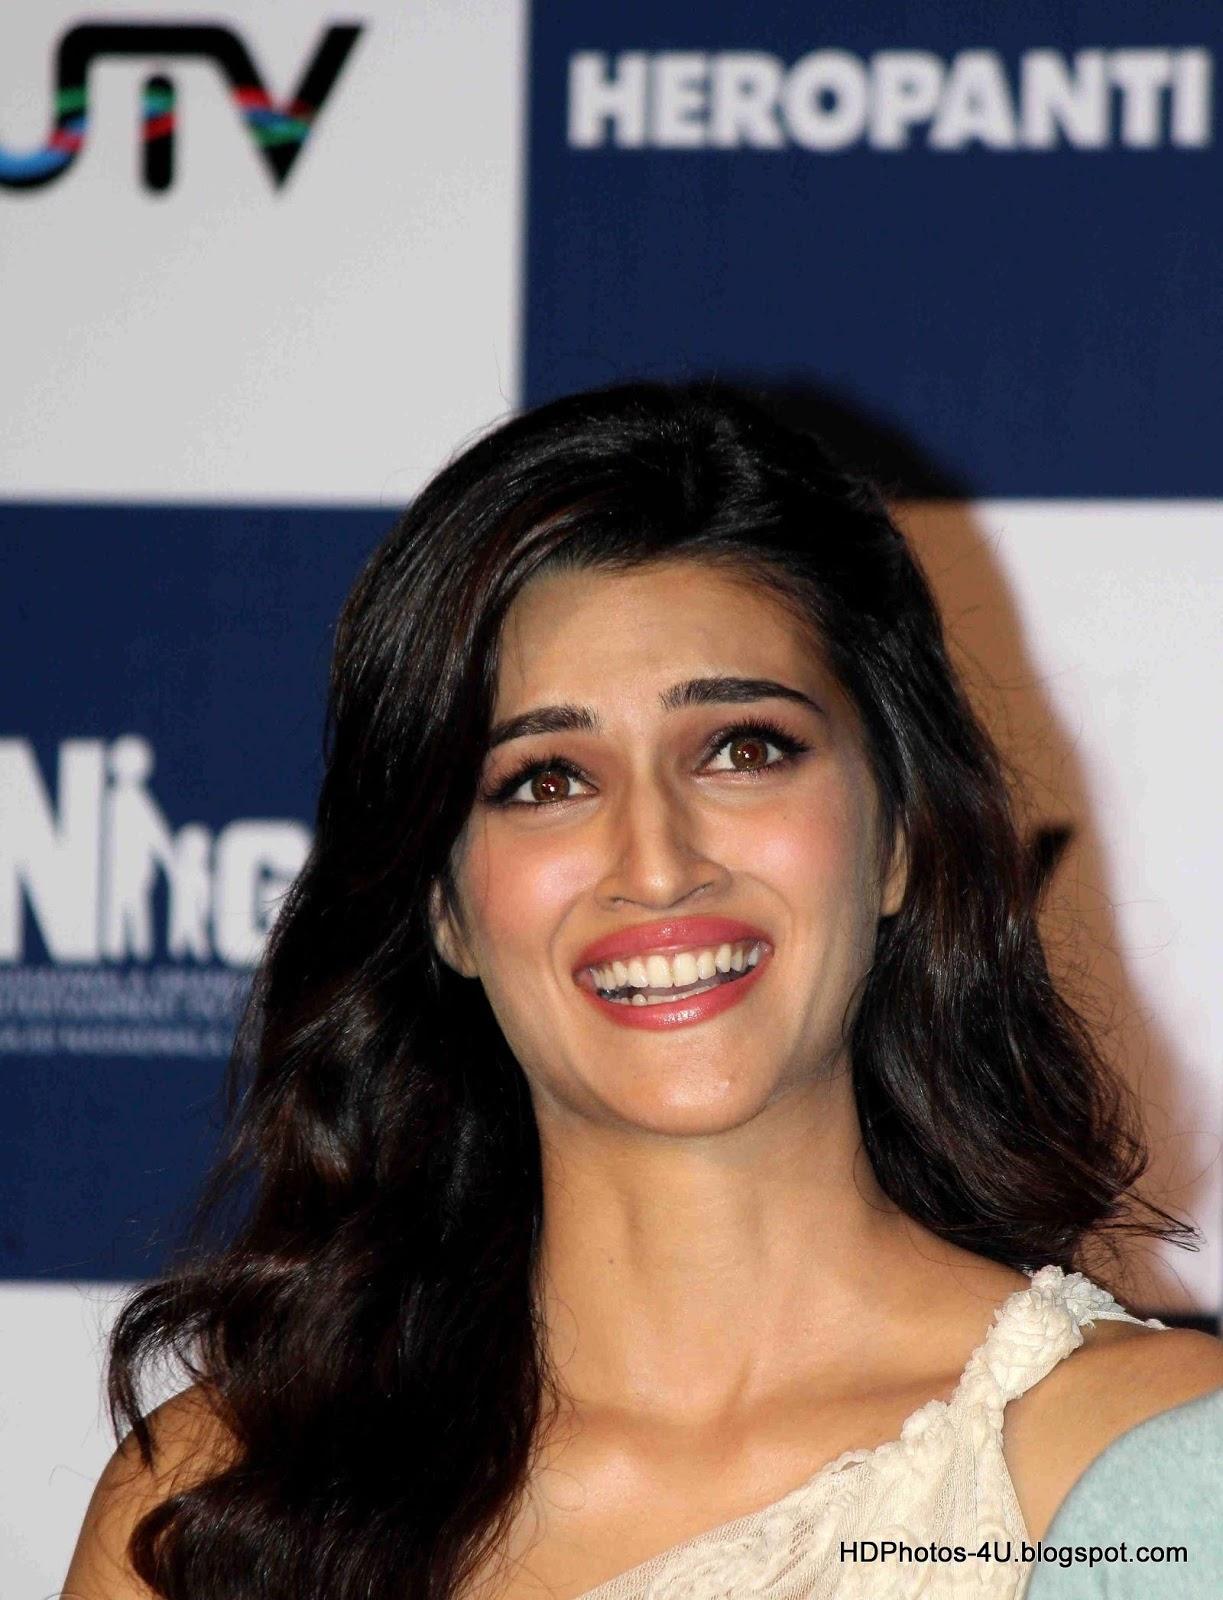 Kriti sanon images hd wallpaper all 4u wallpaper - Heropanti Dilwale Actress Kriti Sanon Hd Photos Wallpapers Wallpapper